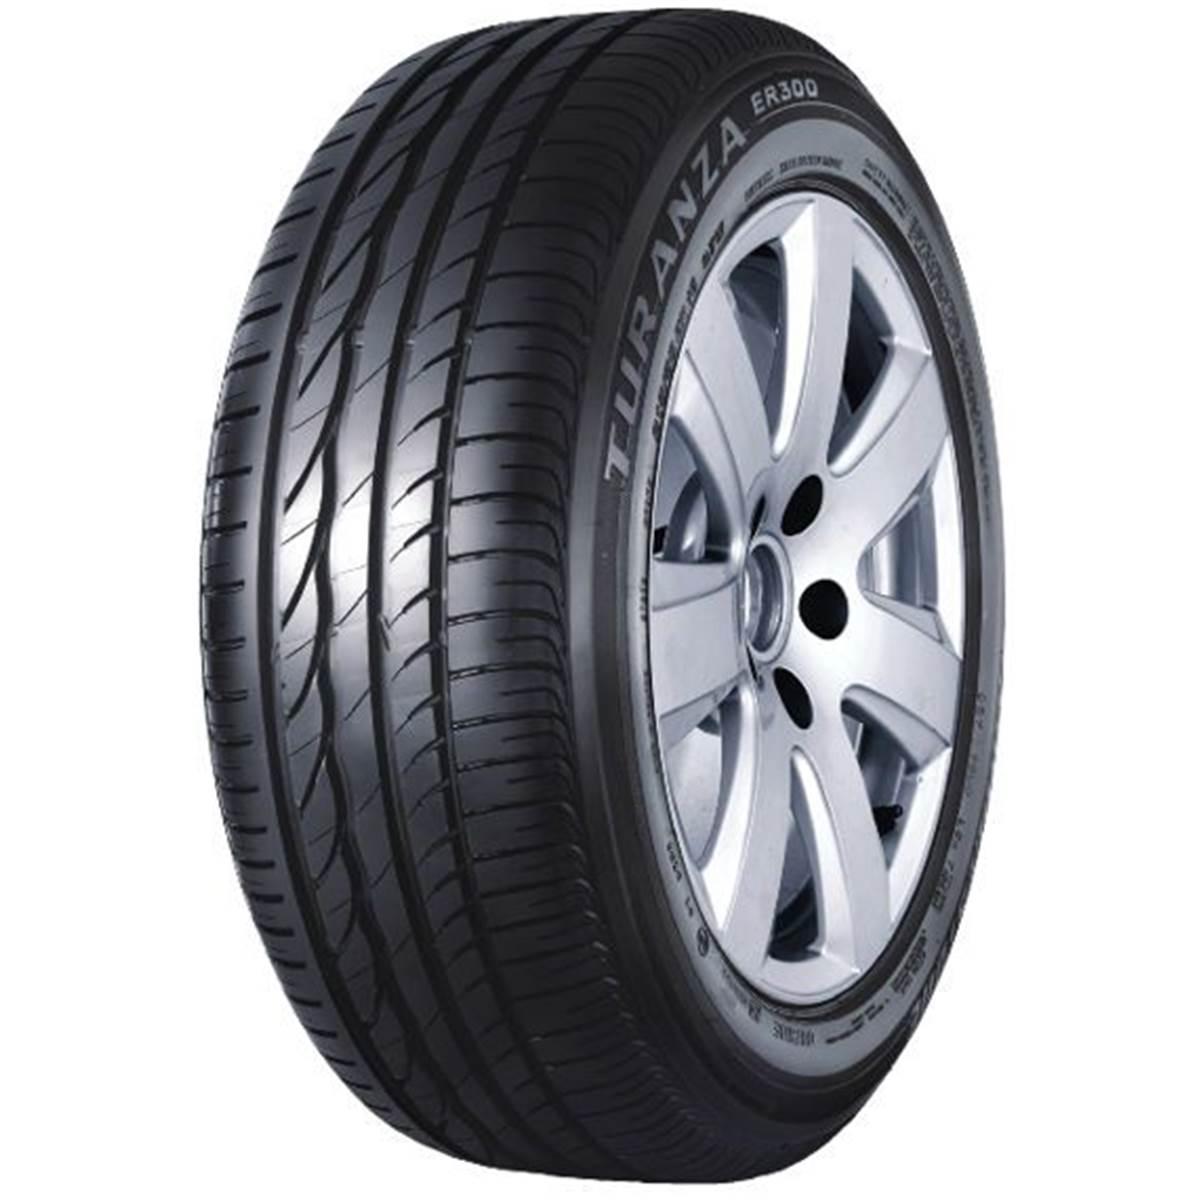 Pneu Bridgestone 225/55R16 95W Turanza Er300